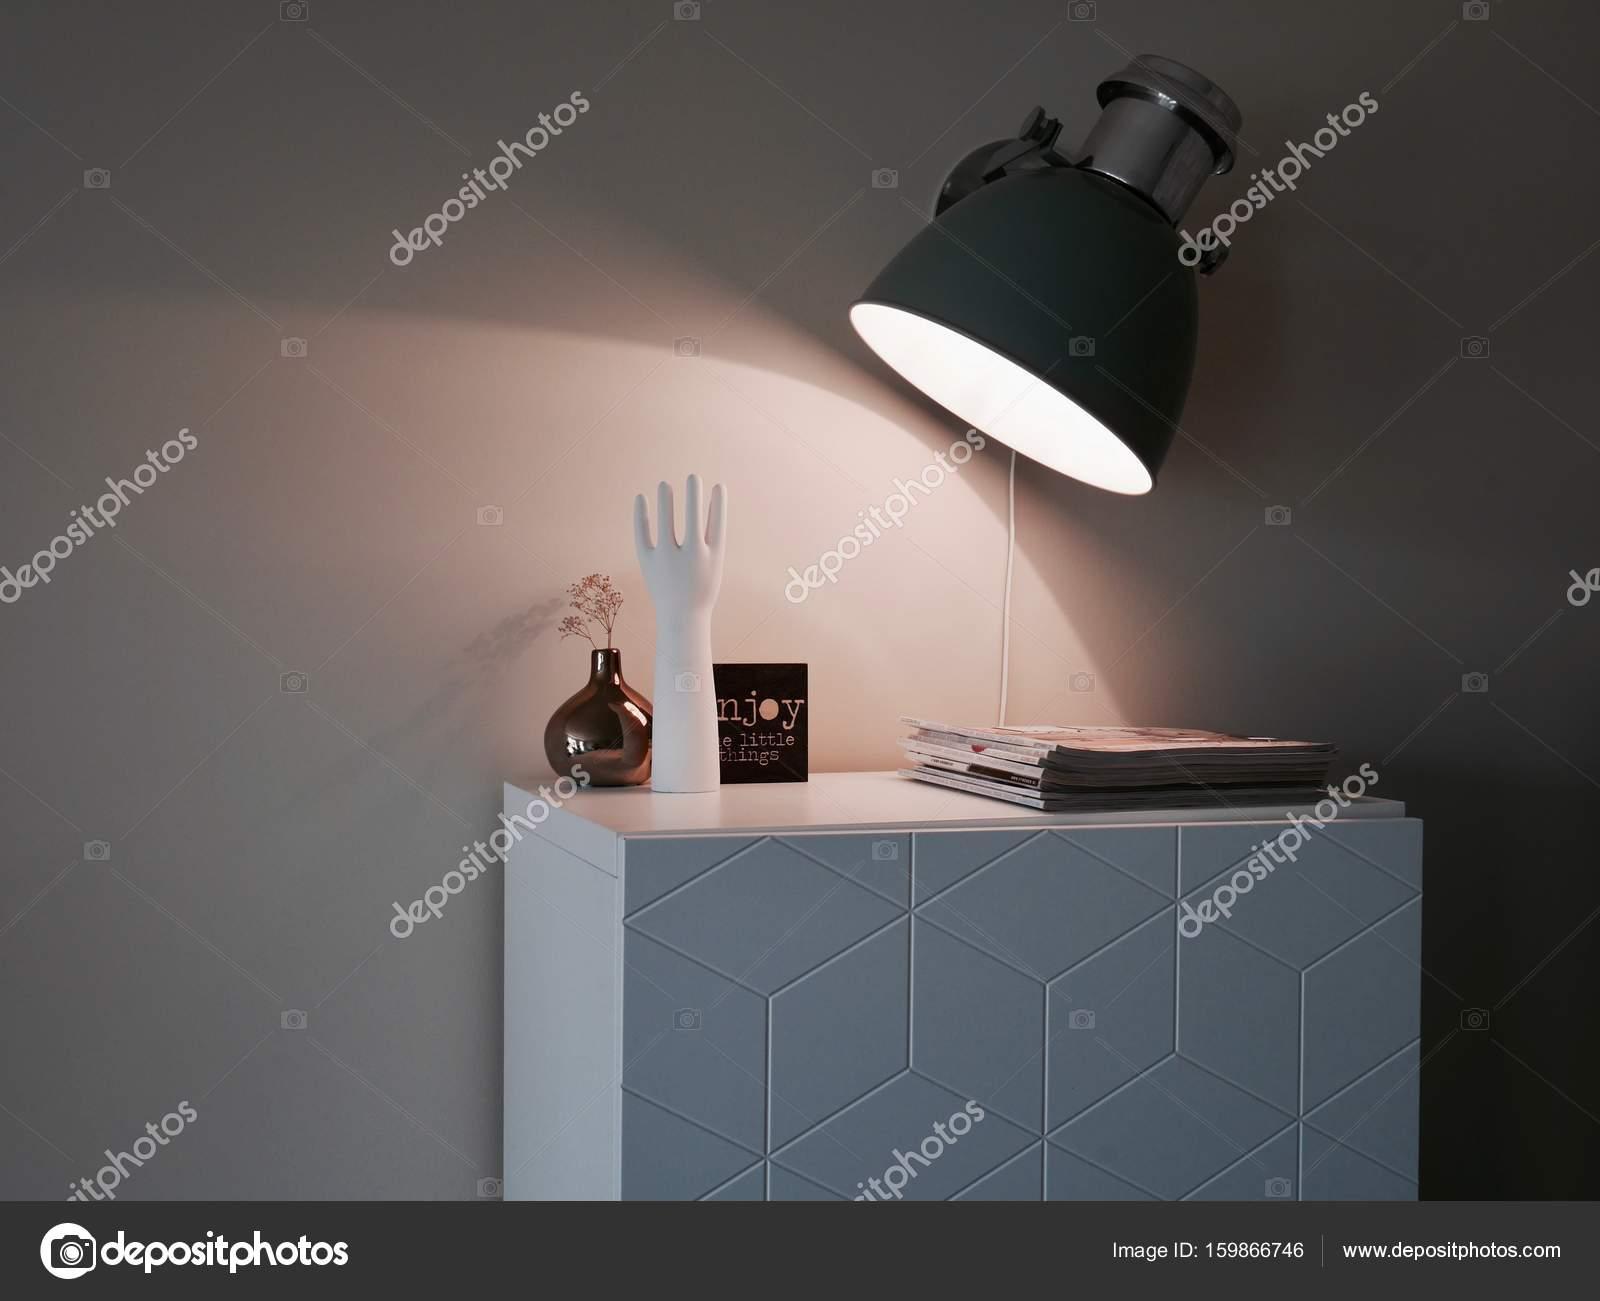 Badkamerkast Met Lamp : Moderne kast wandlamp decoratie u2014 Стоковое фото © mixinstijl